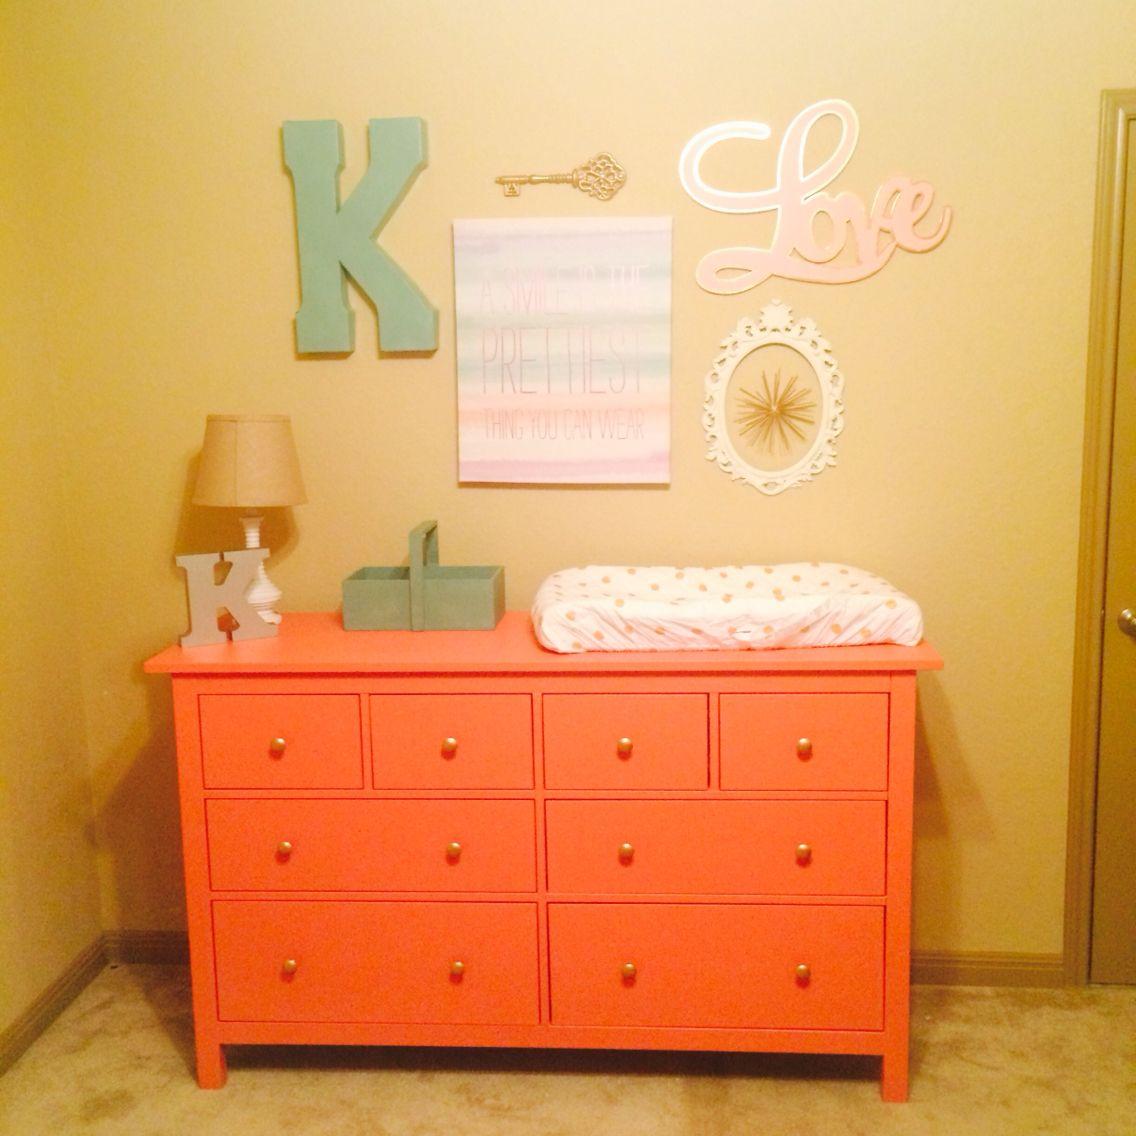 Baby kallies room Room, Home decor